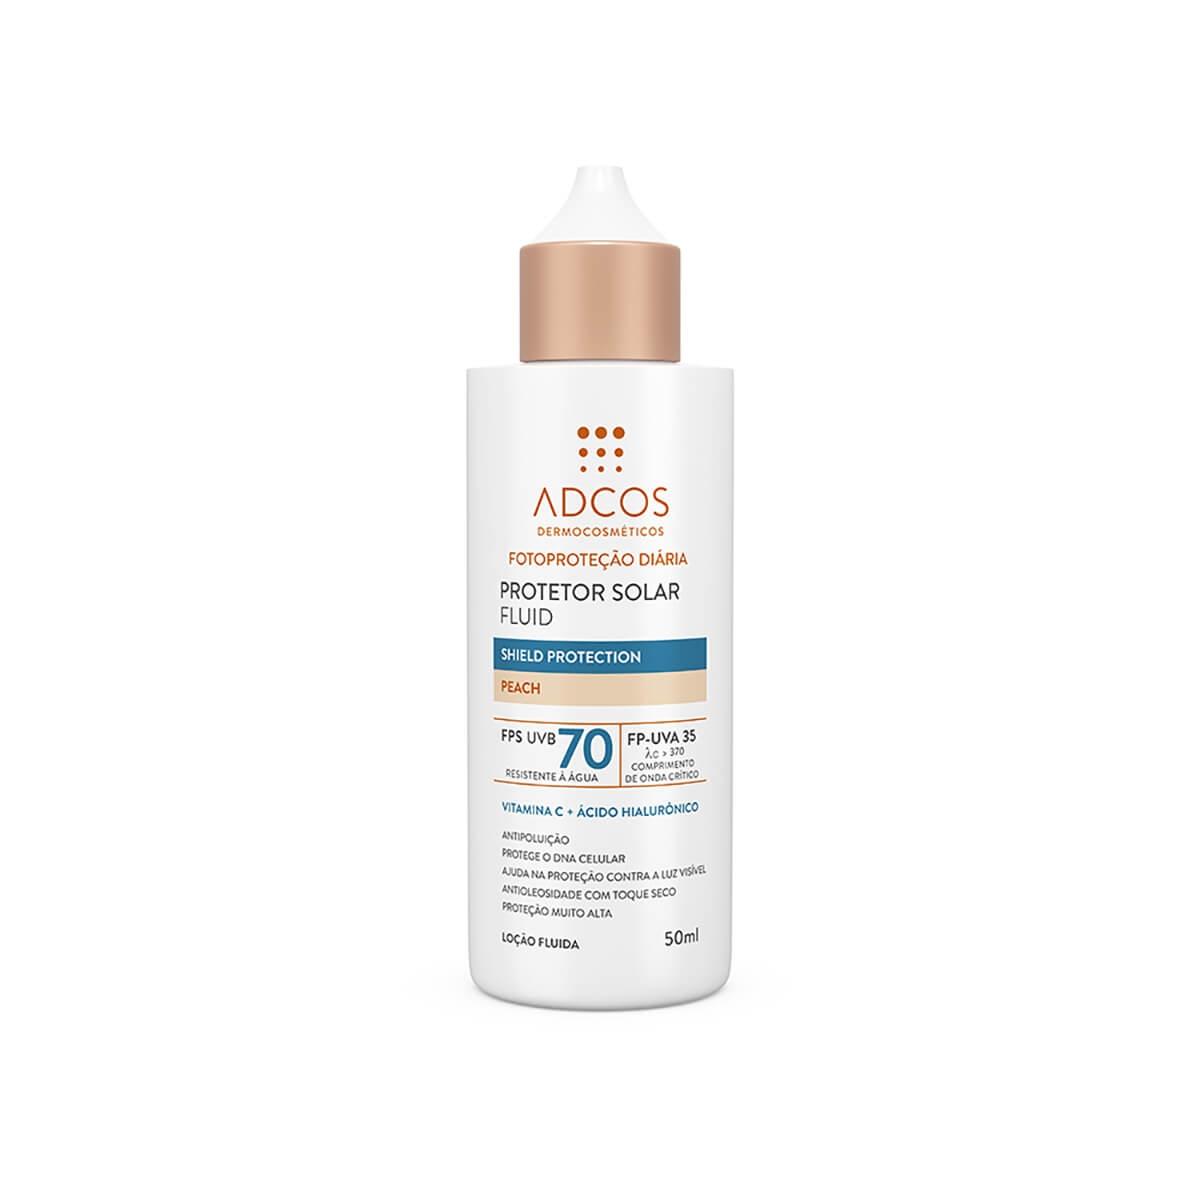 Protetor Solar Fluid Adcos Shield Protection Peach FPS70 50ml